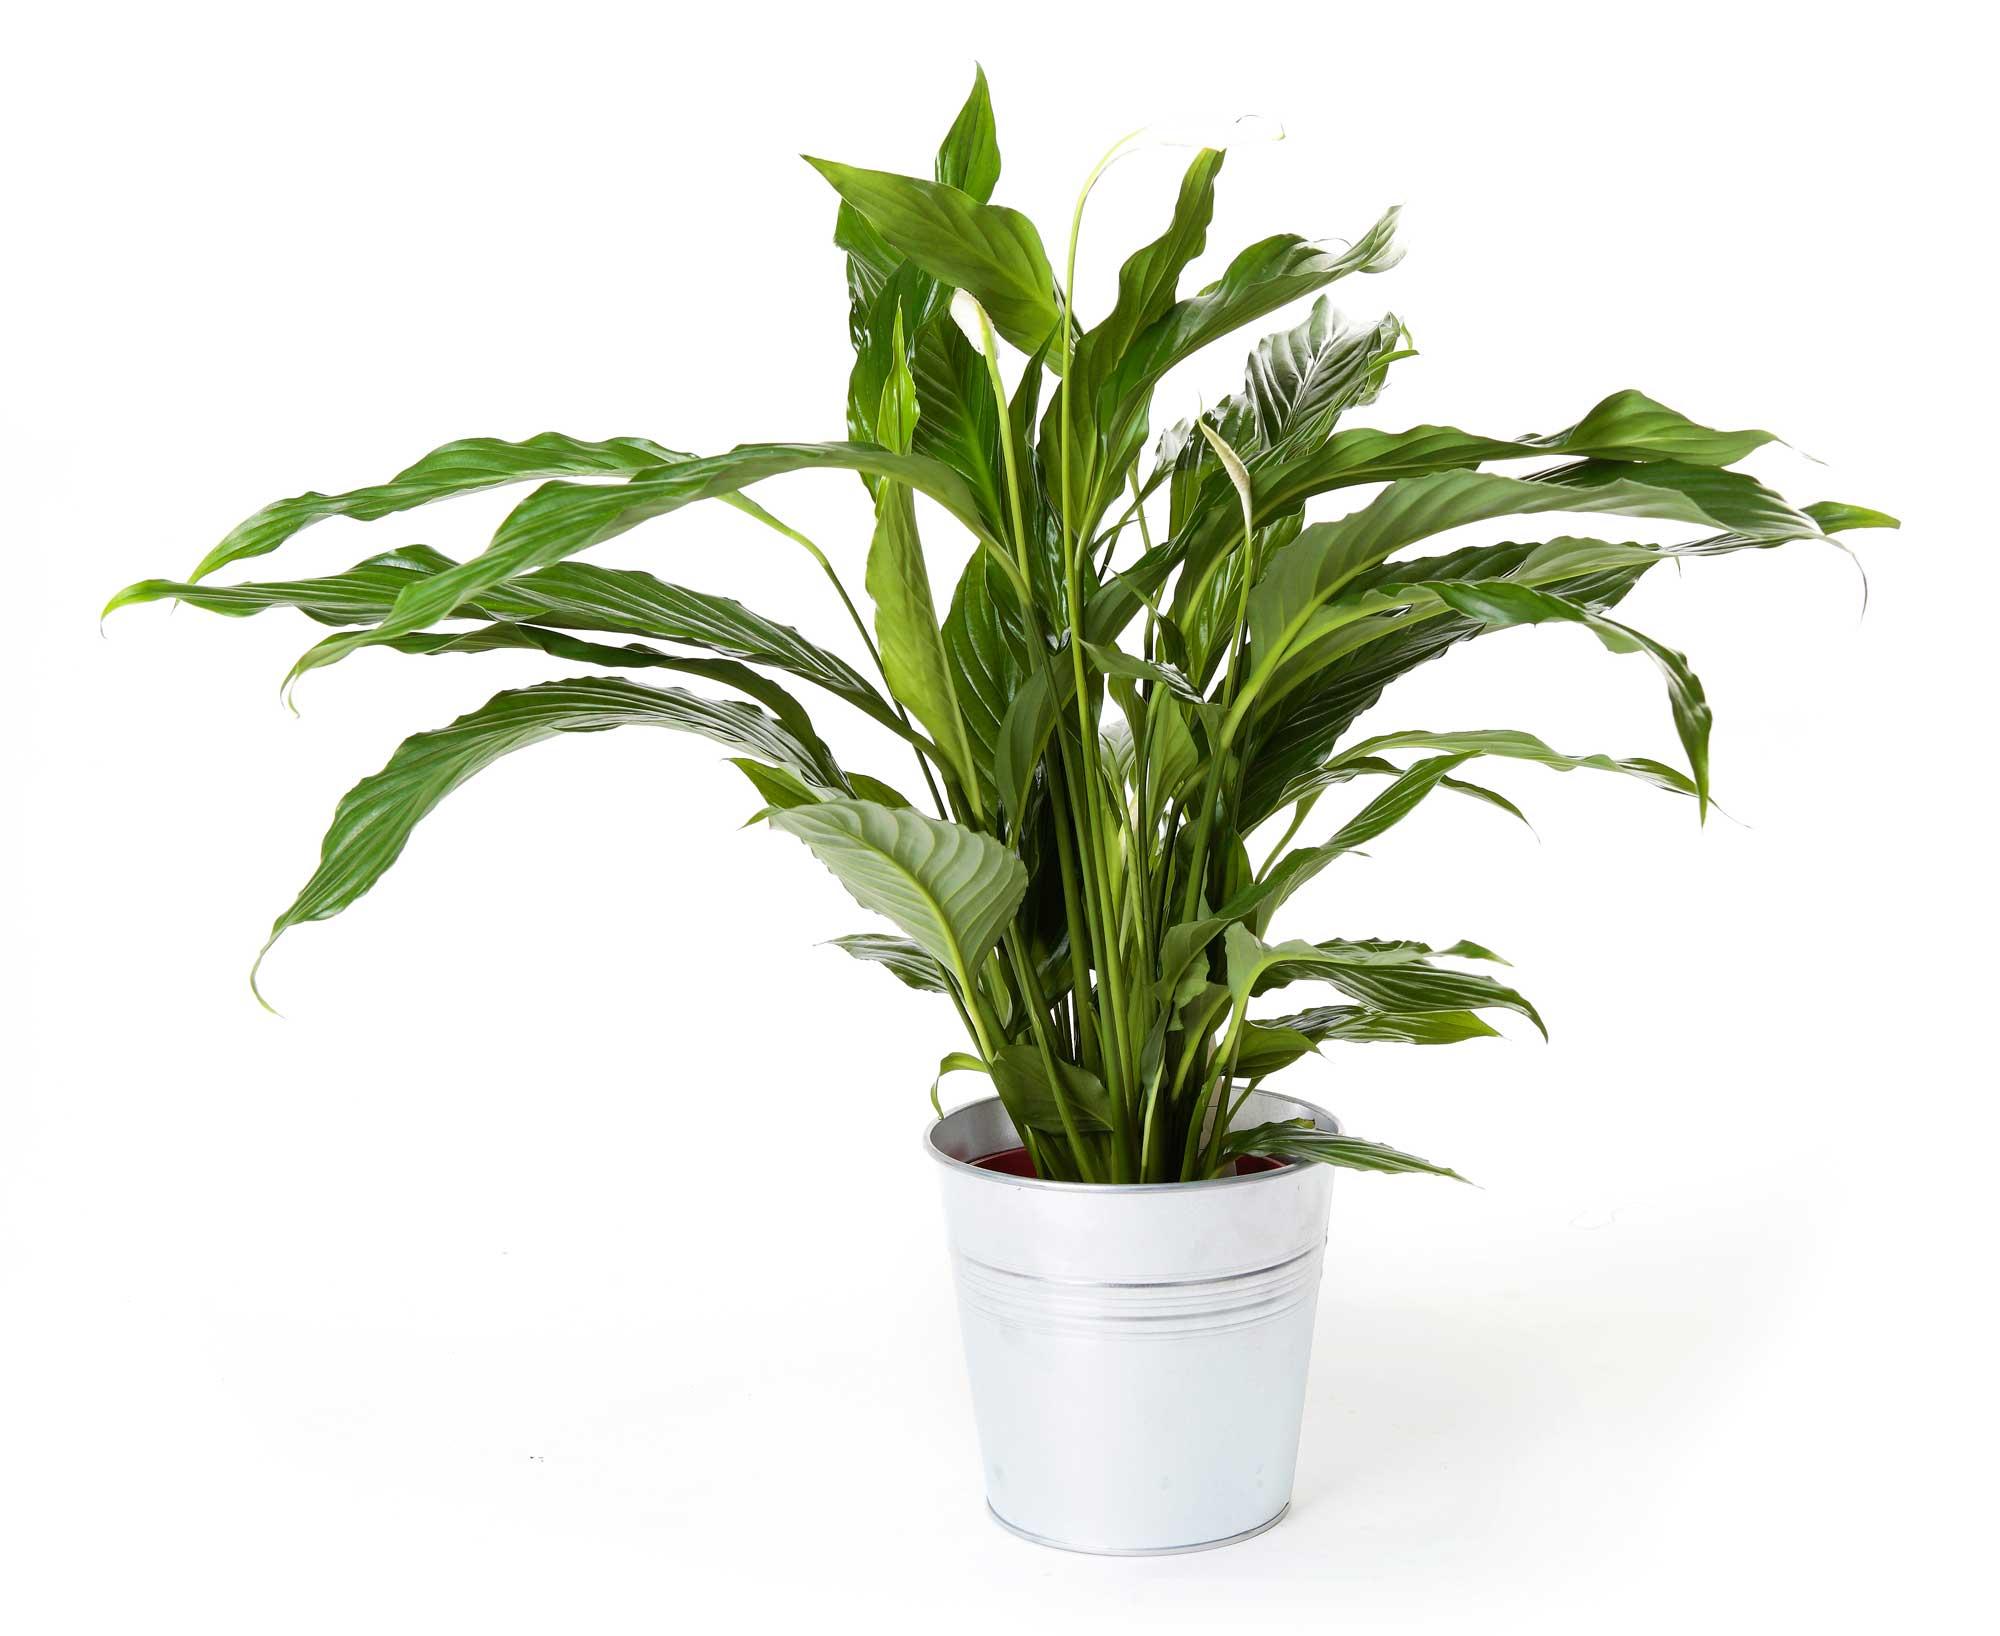 Plantas decorativas interior cyperus plstico unids x for Plantas de interior decorativas